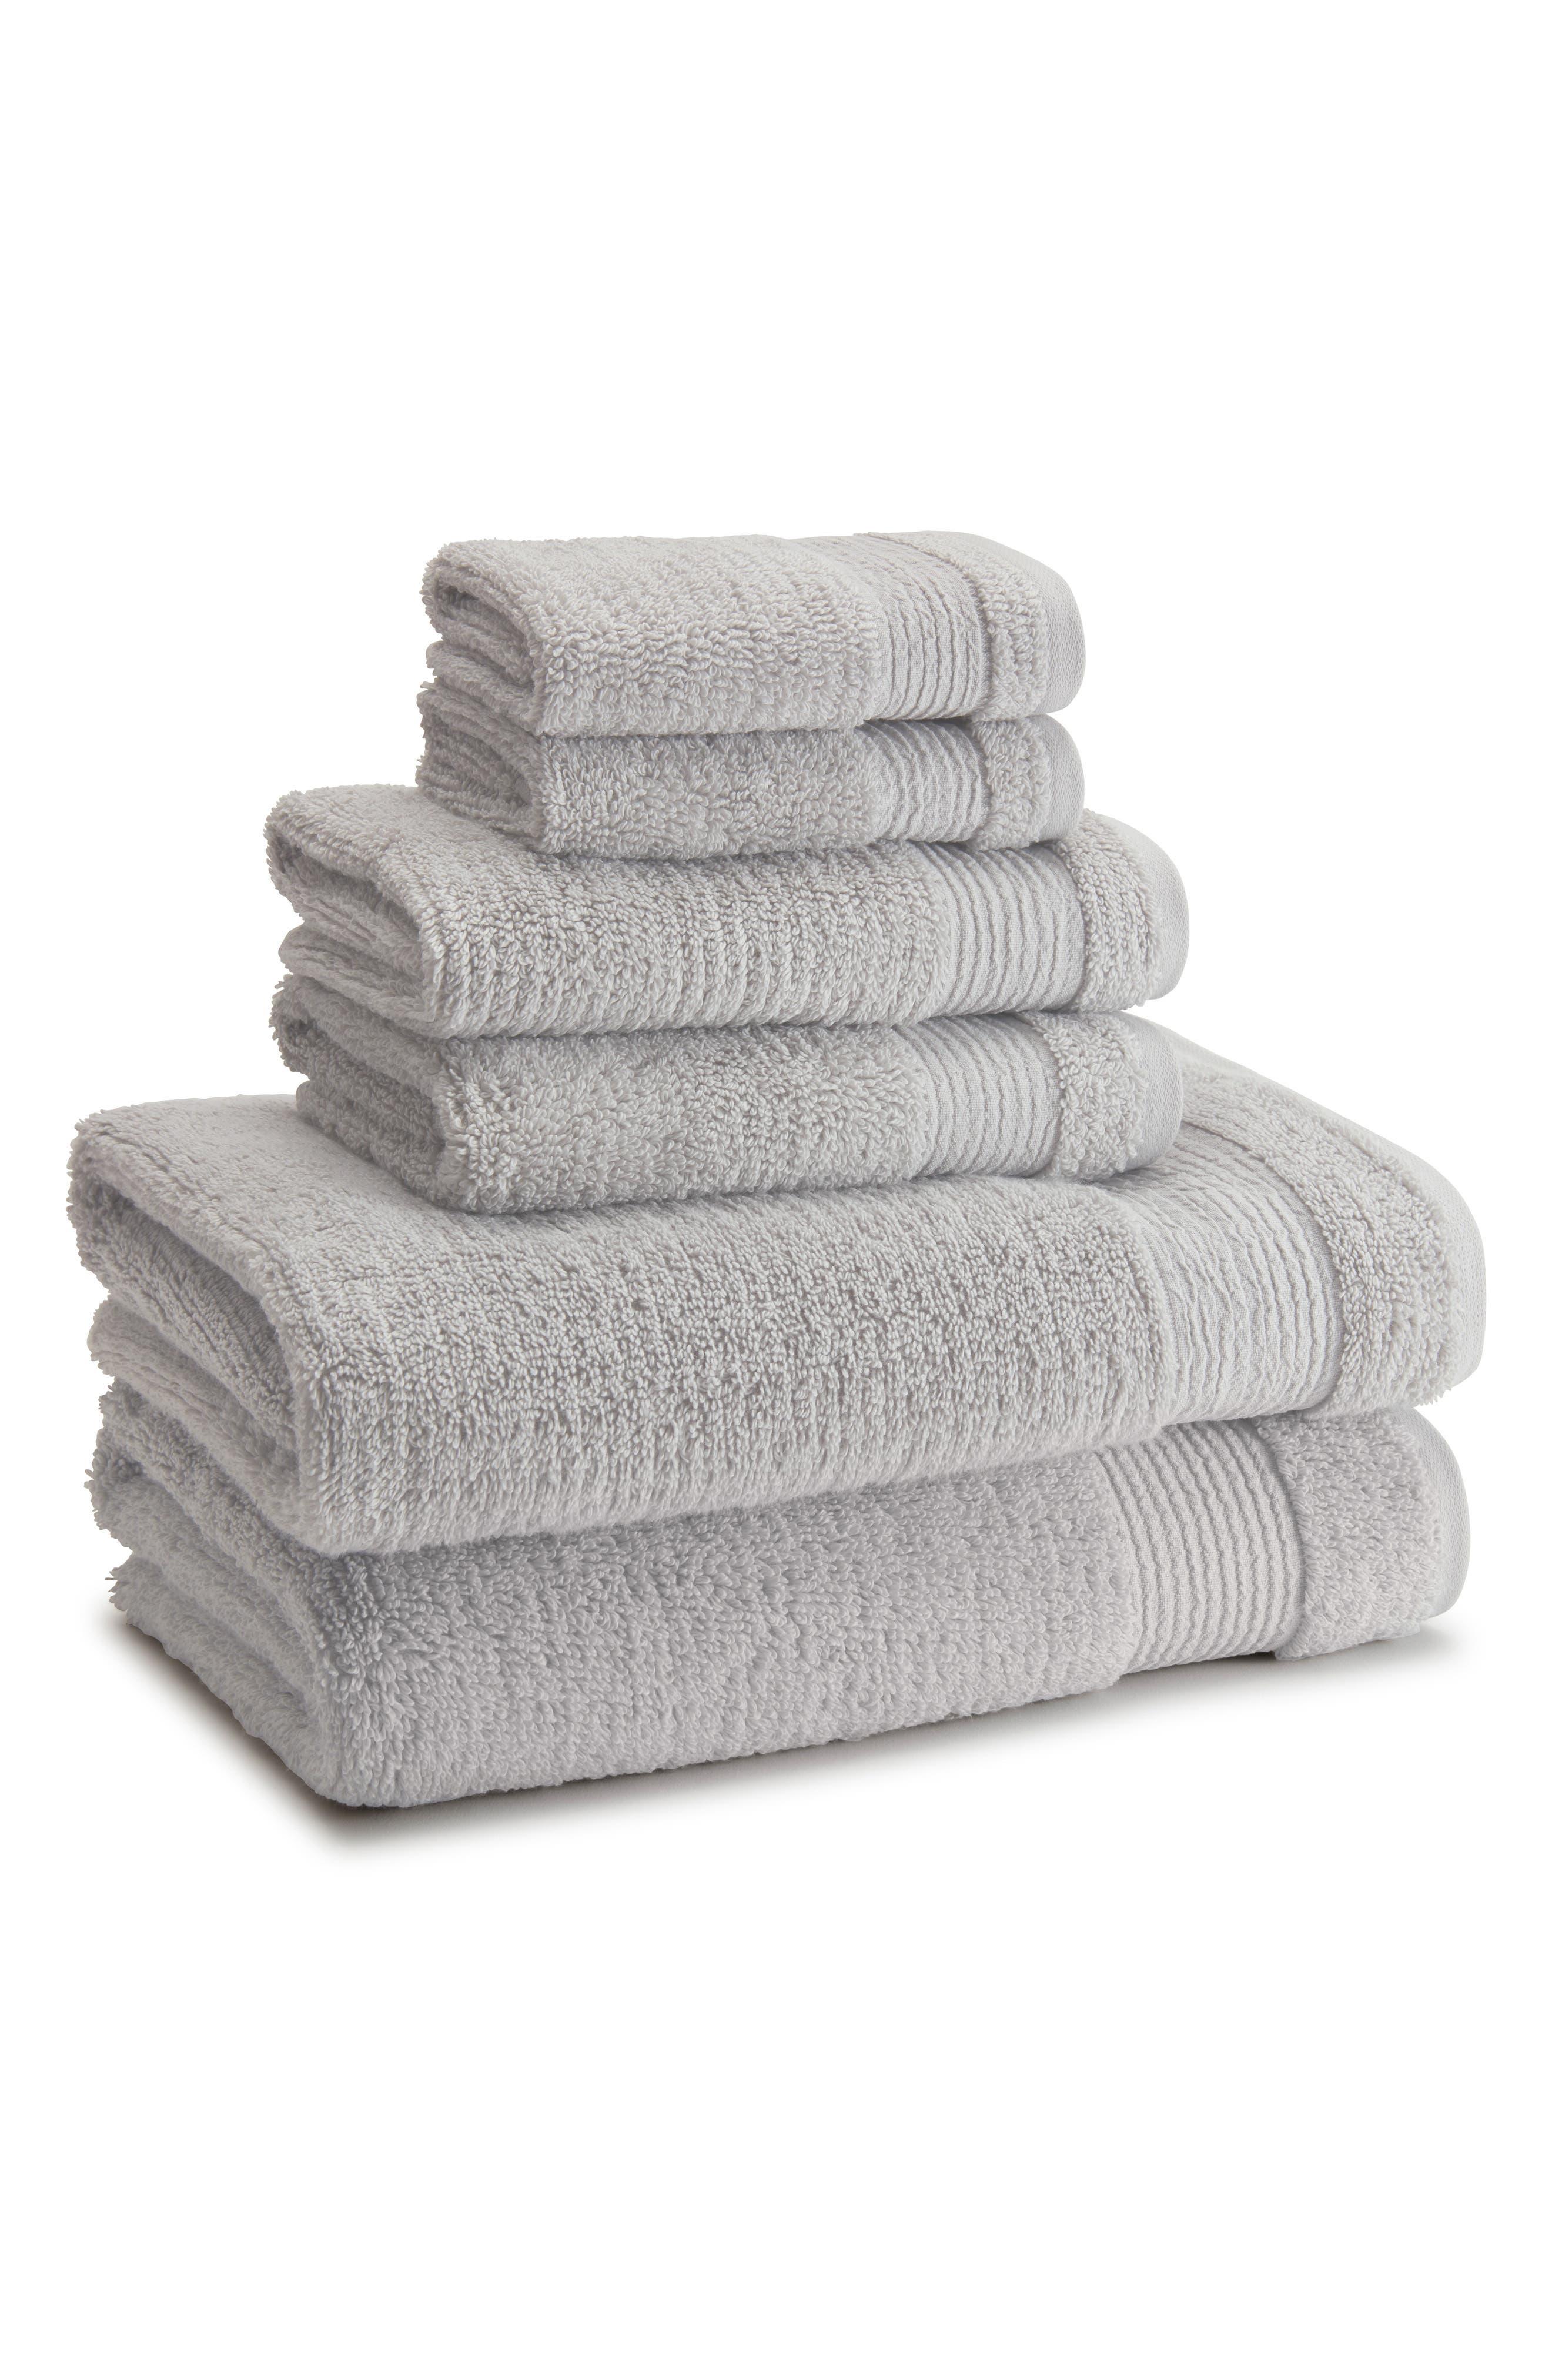 Pergamon Bath Towel,                             Main thumbnail 1, color,                             PLATINUM